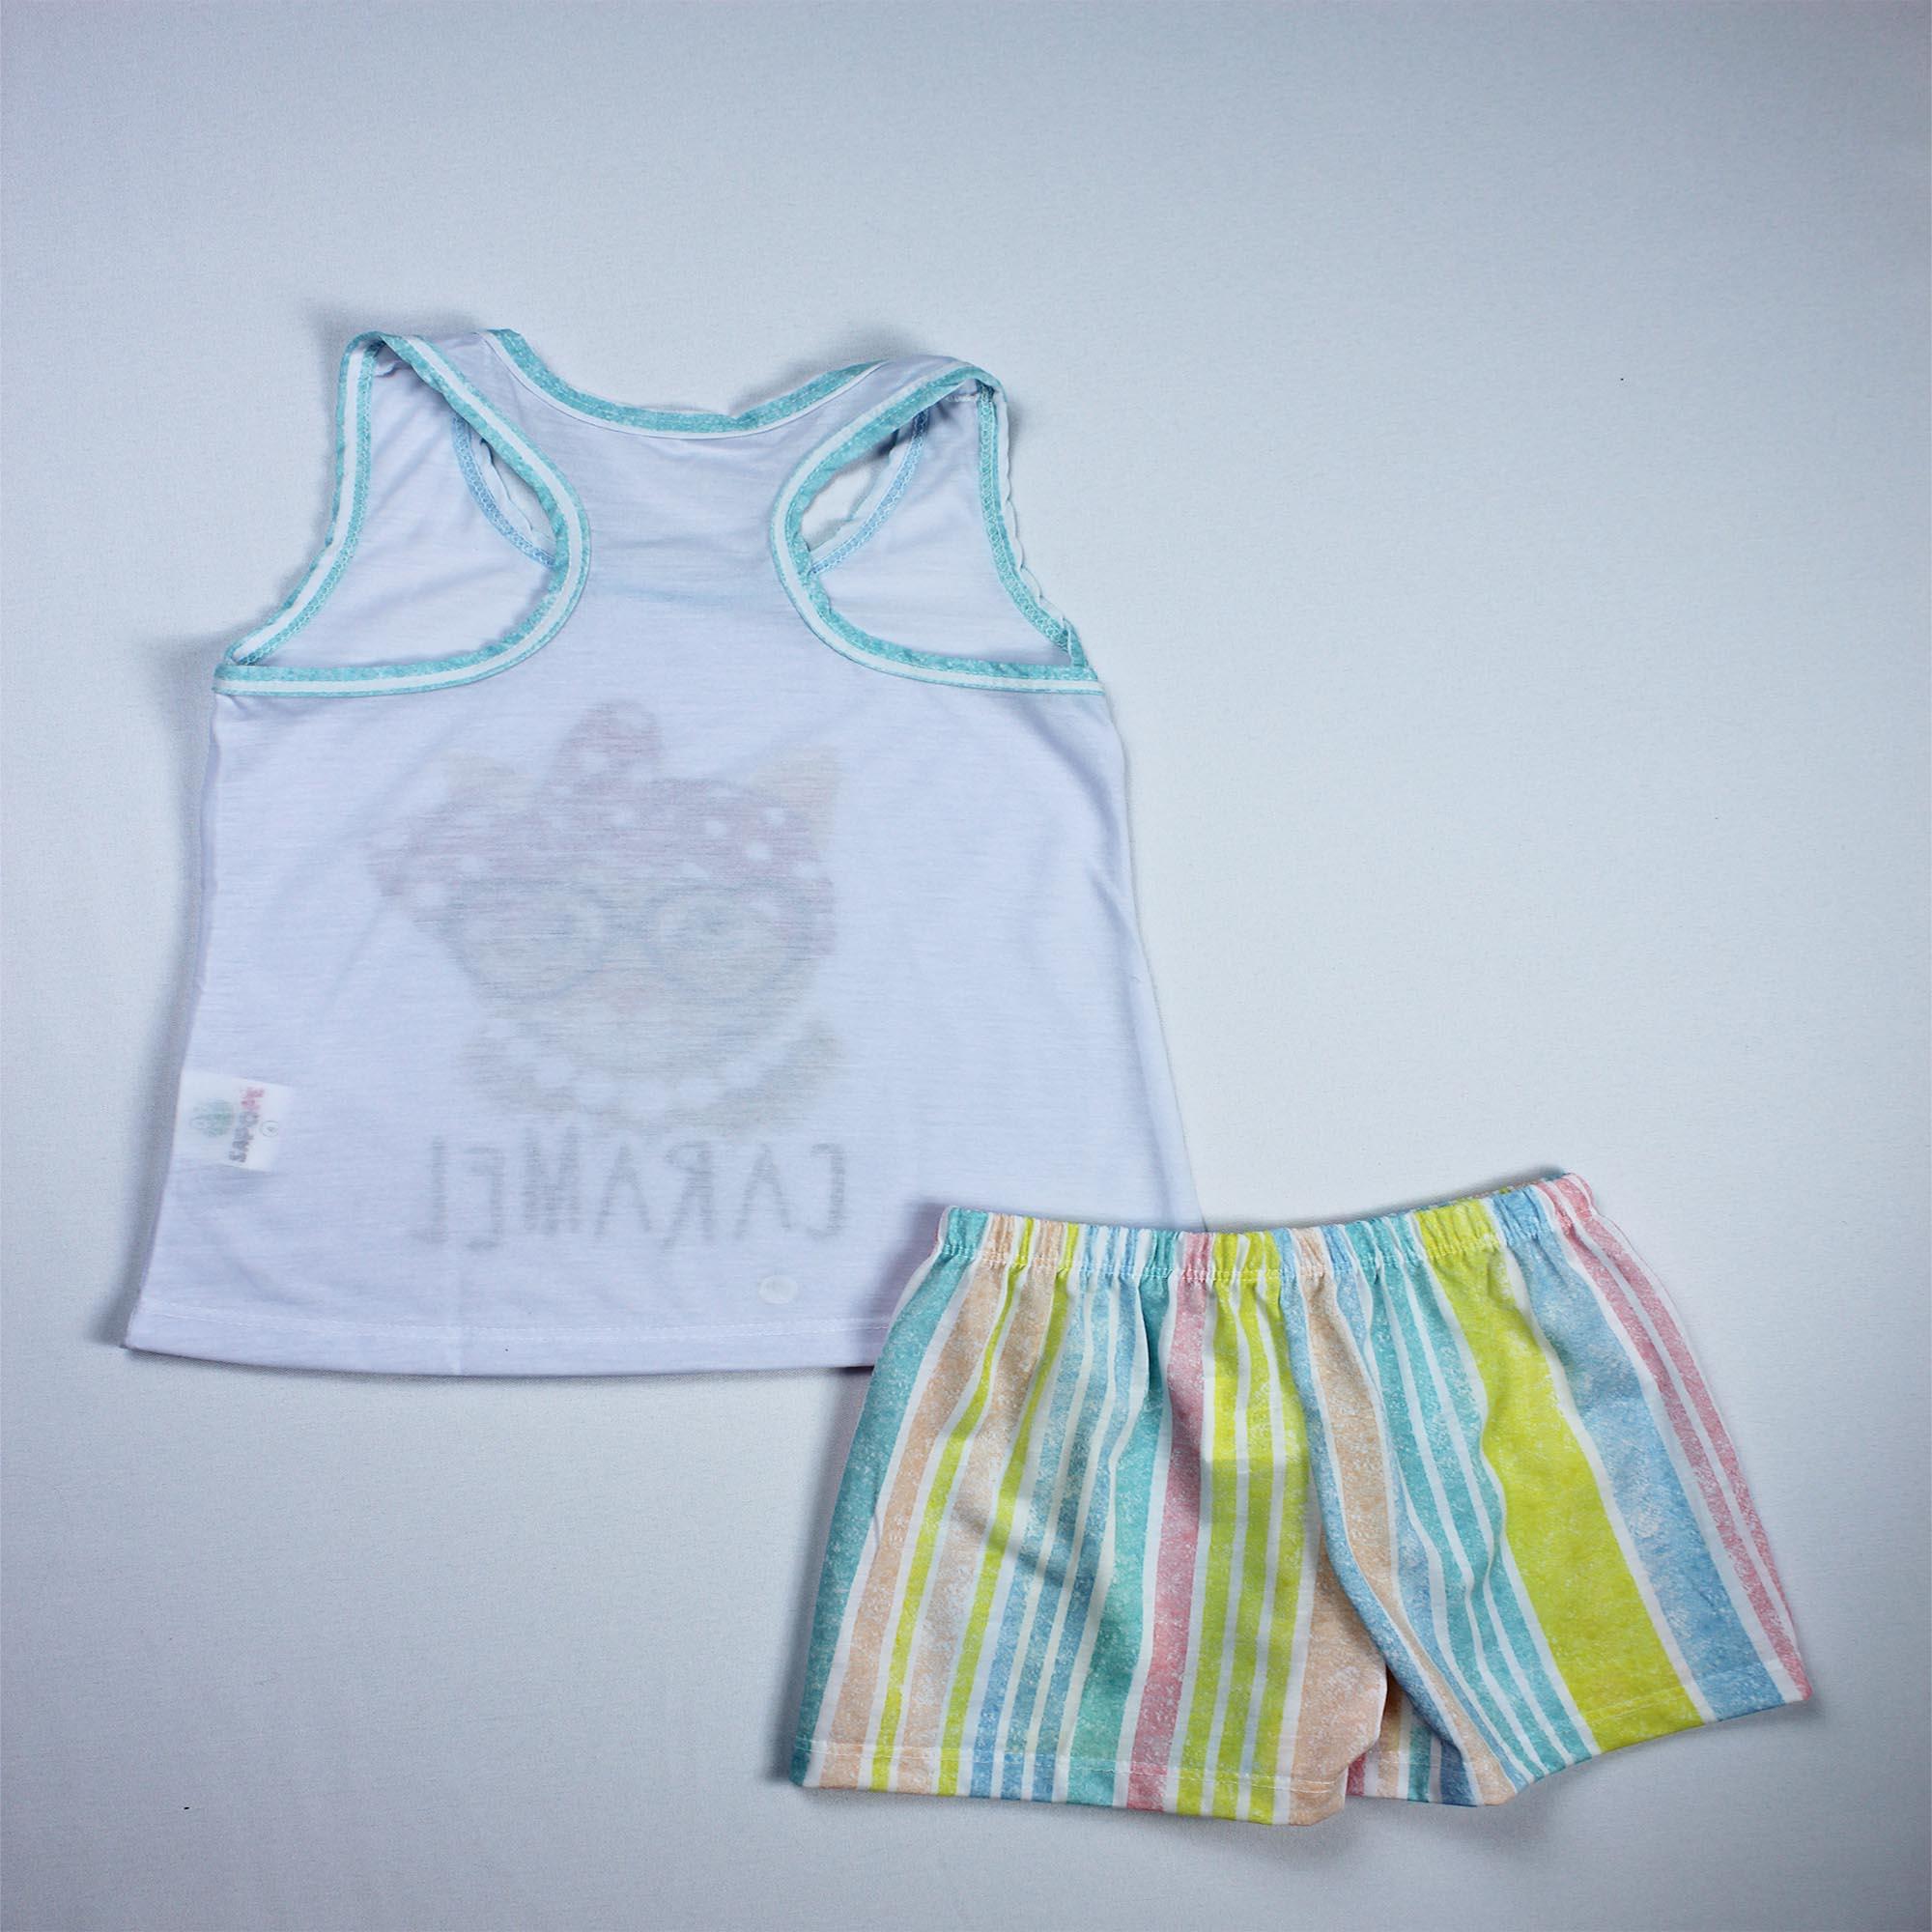 Pijama Regata Infantil Menina - Tamanho 6